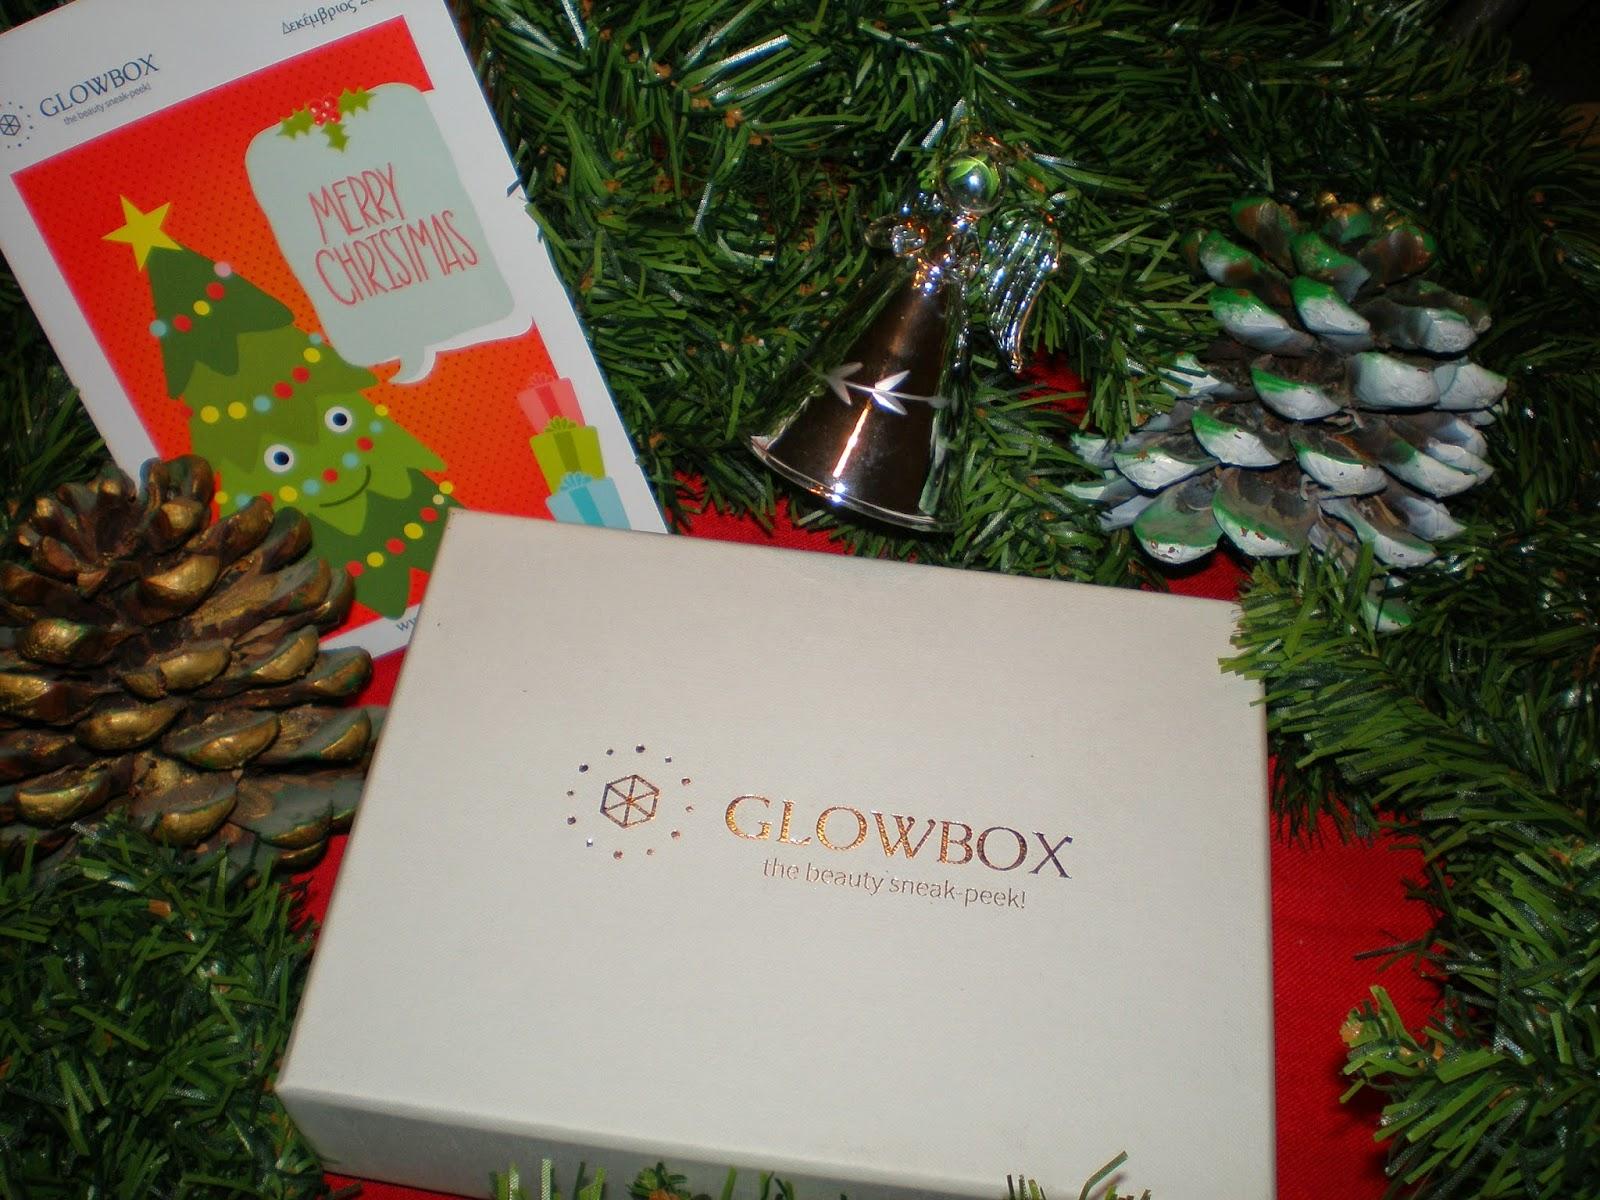 December Glowbox